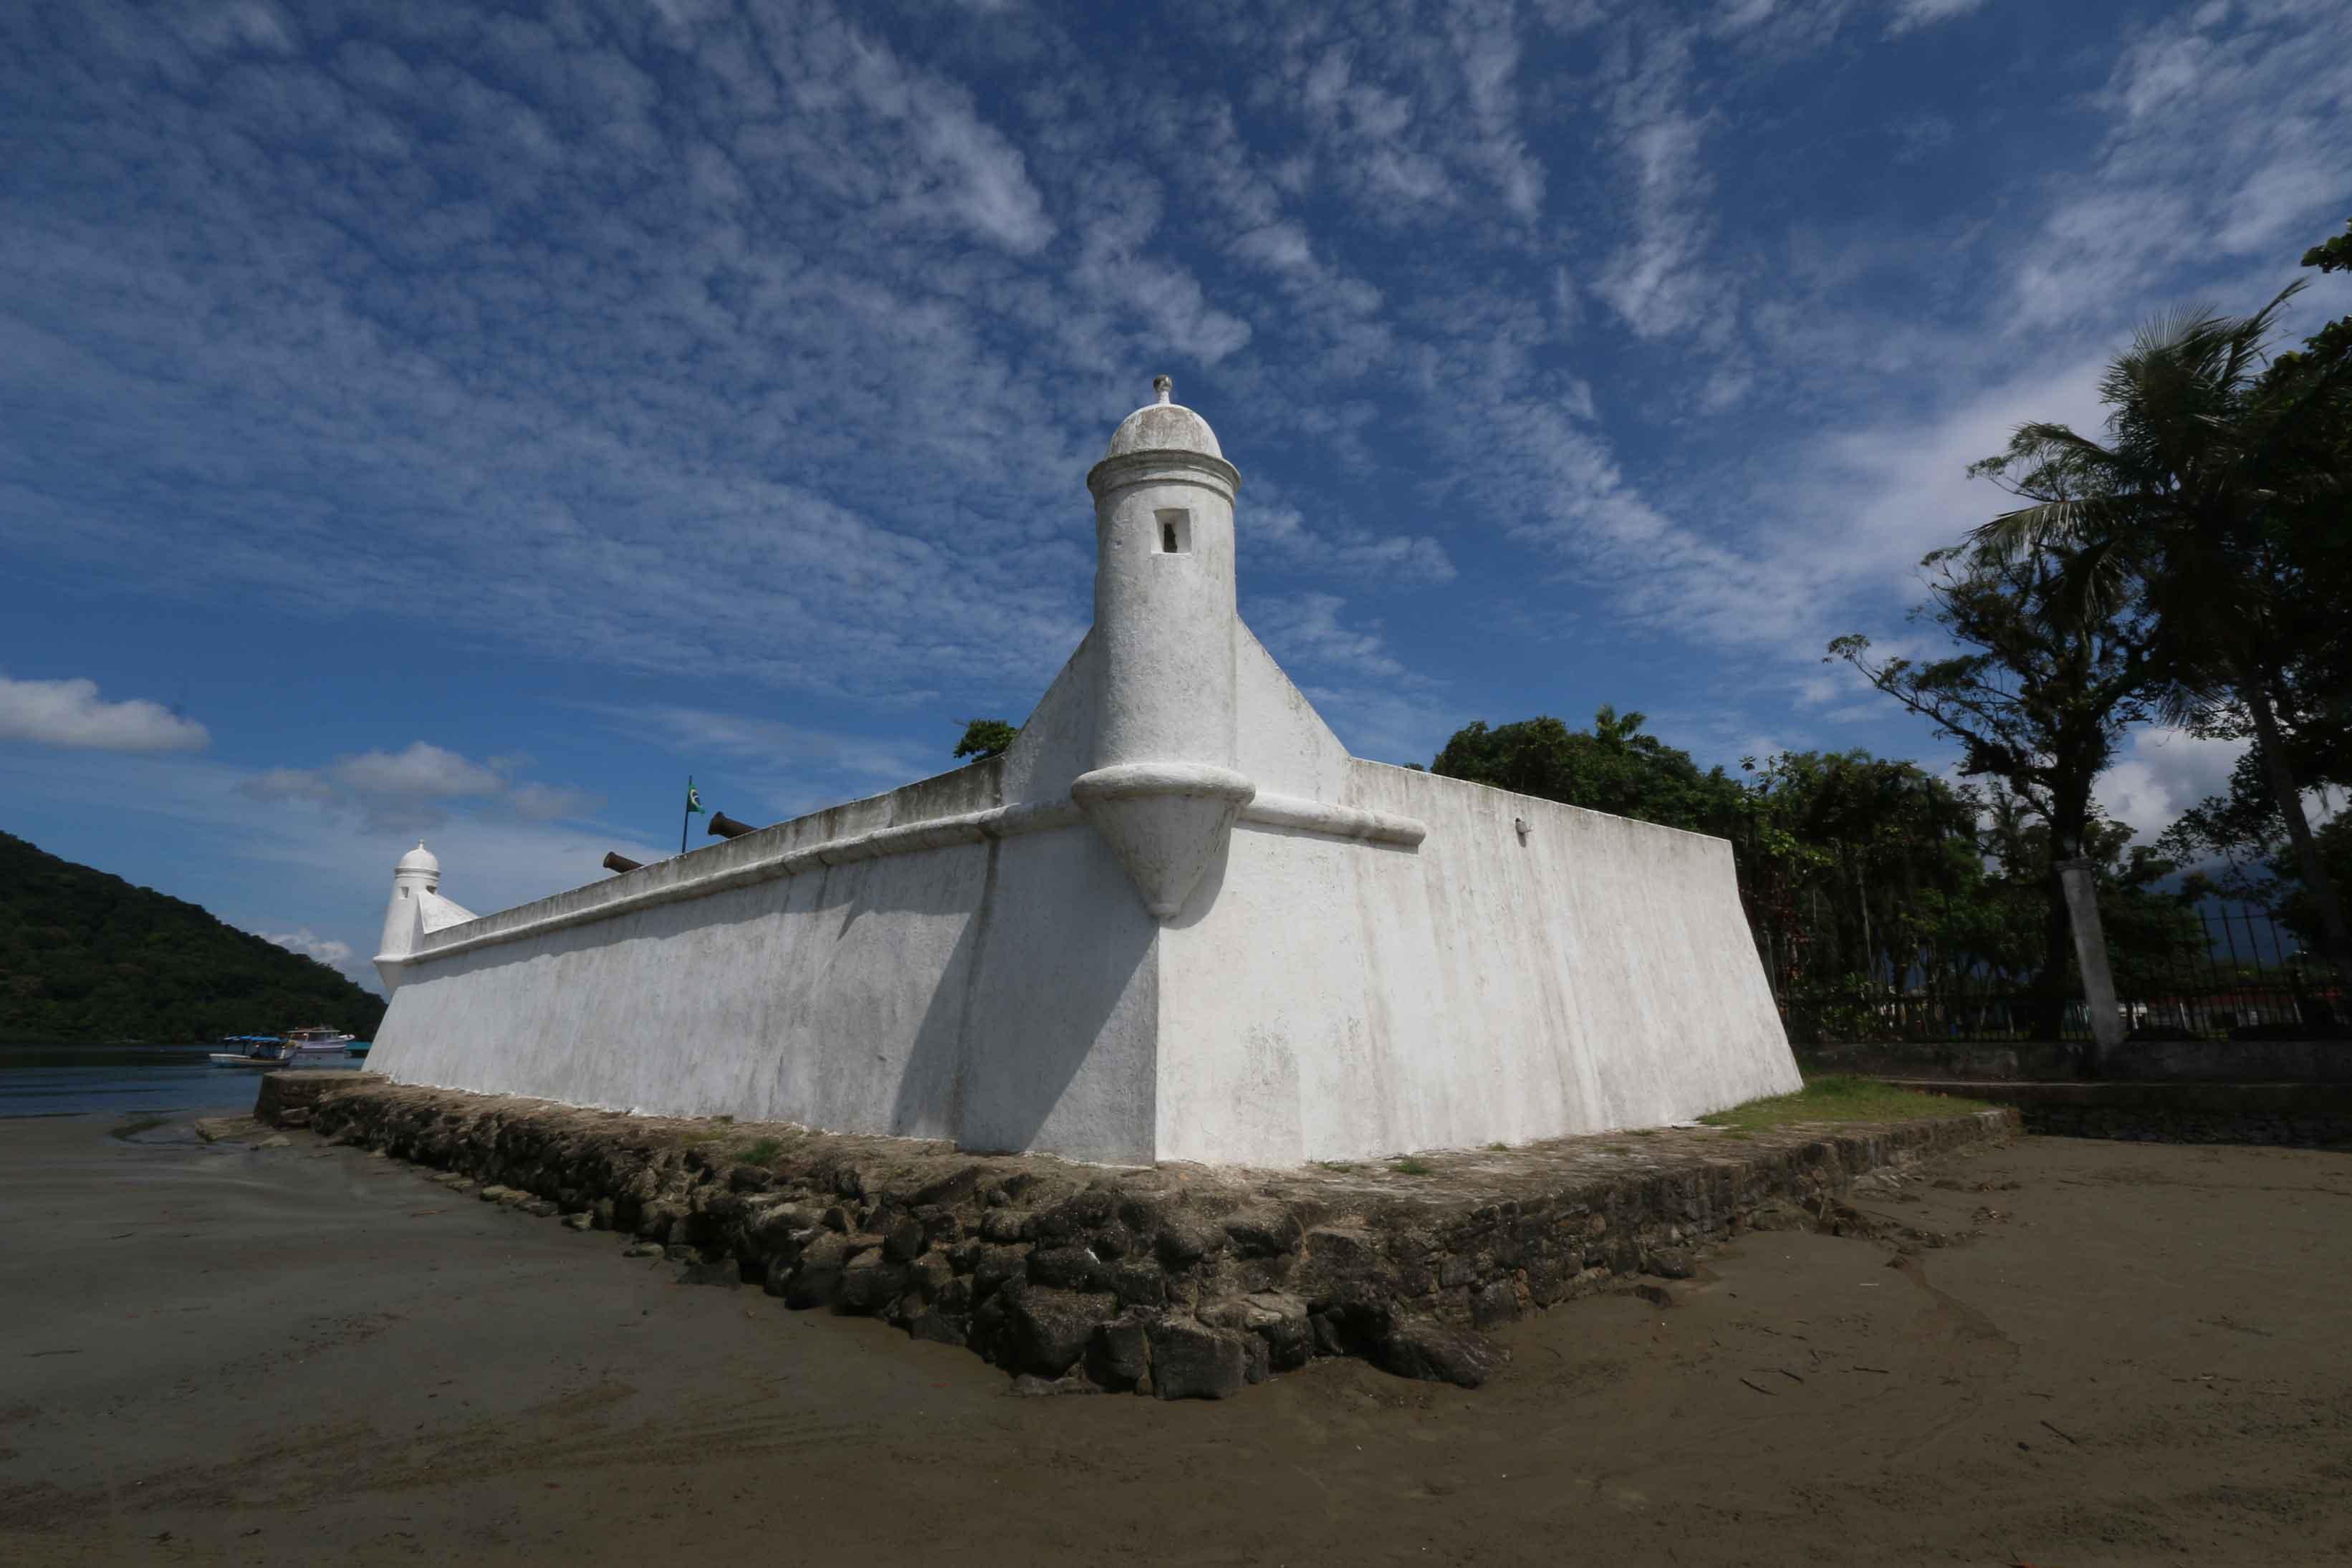 Bertioga-historia-forte-Sao-Joao-Thiago-IMG_7954-bx